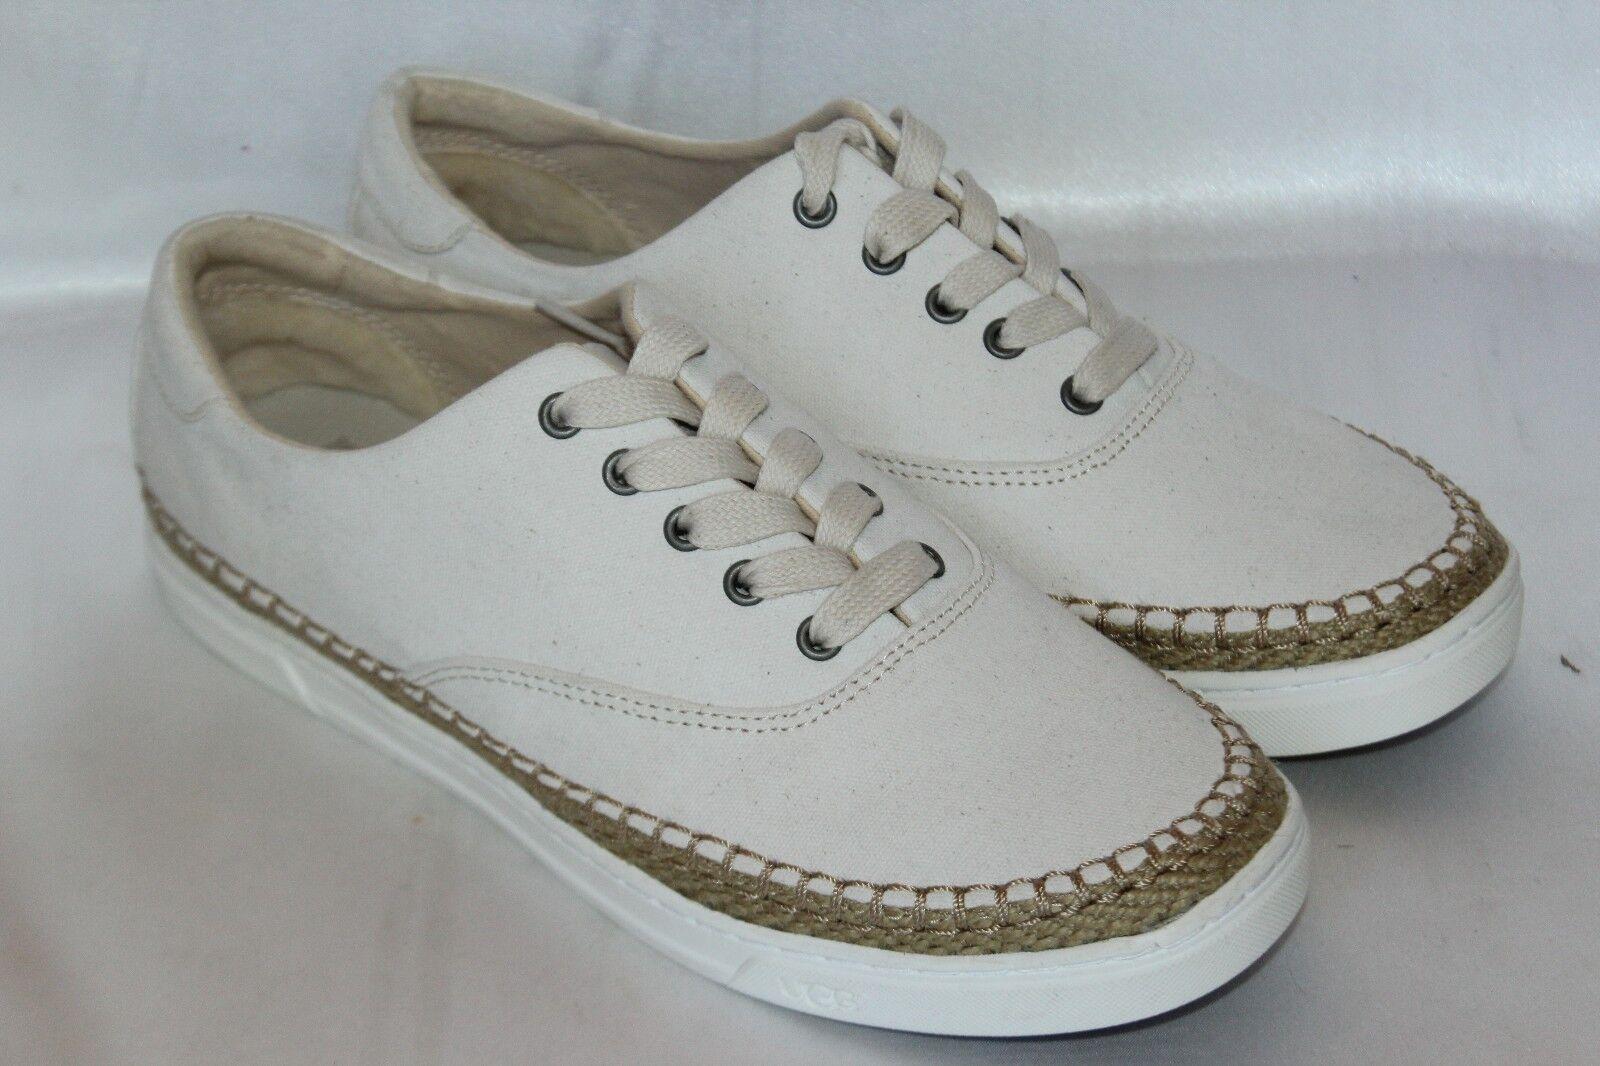 NEU!FEDER!UGG AUSTRALIA Weißes Segeltuch zum Schnüren EYAN II Sneakers Bootsschuhe Gr